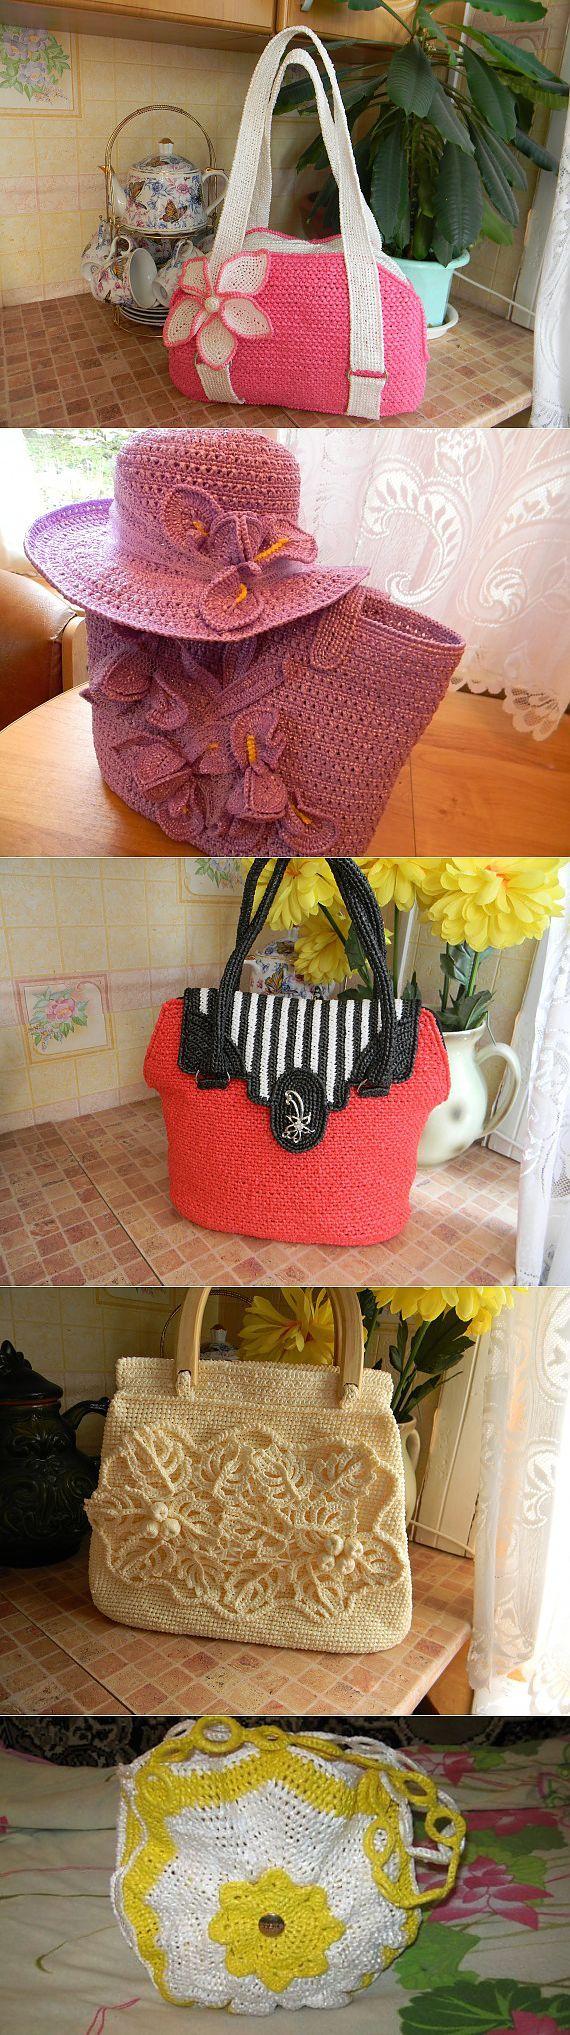 Bellos bolsos de crochet